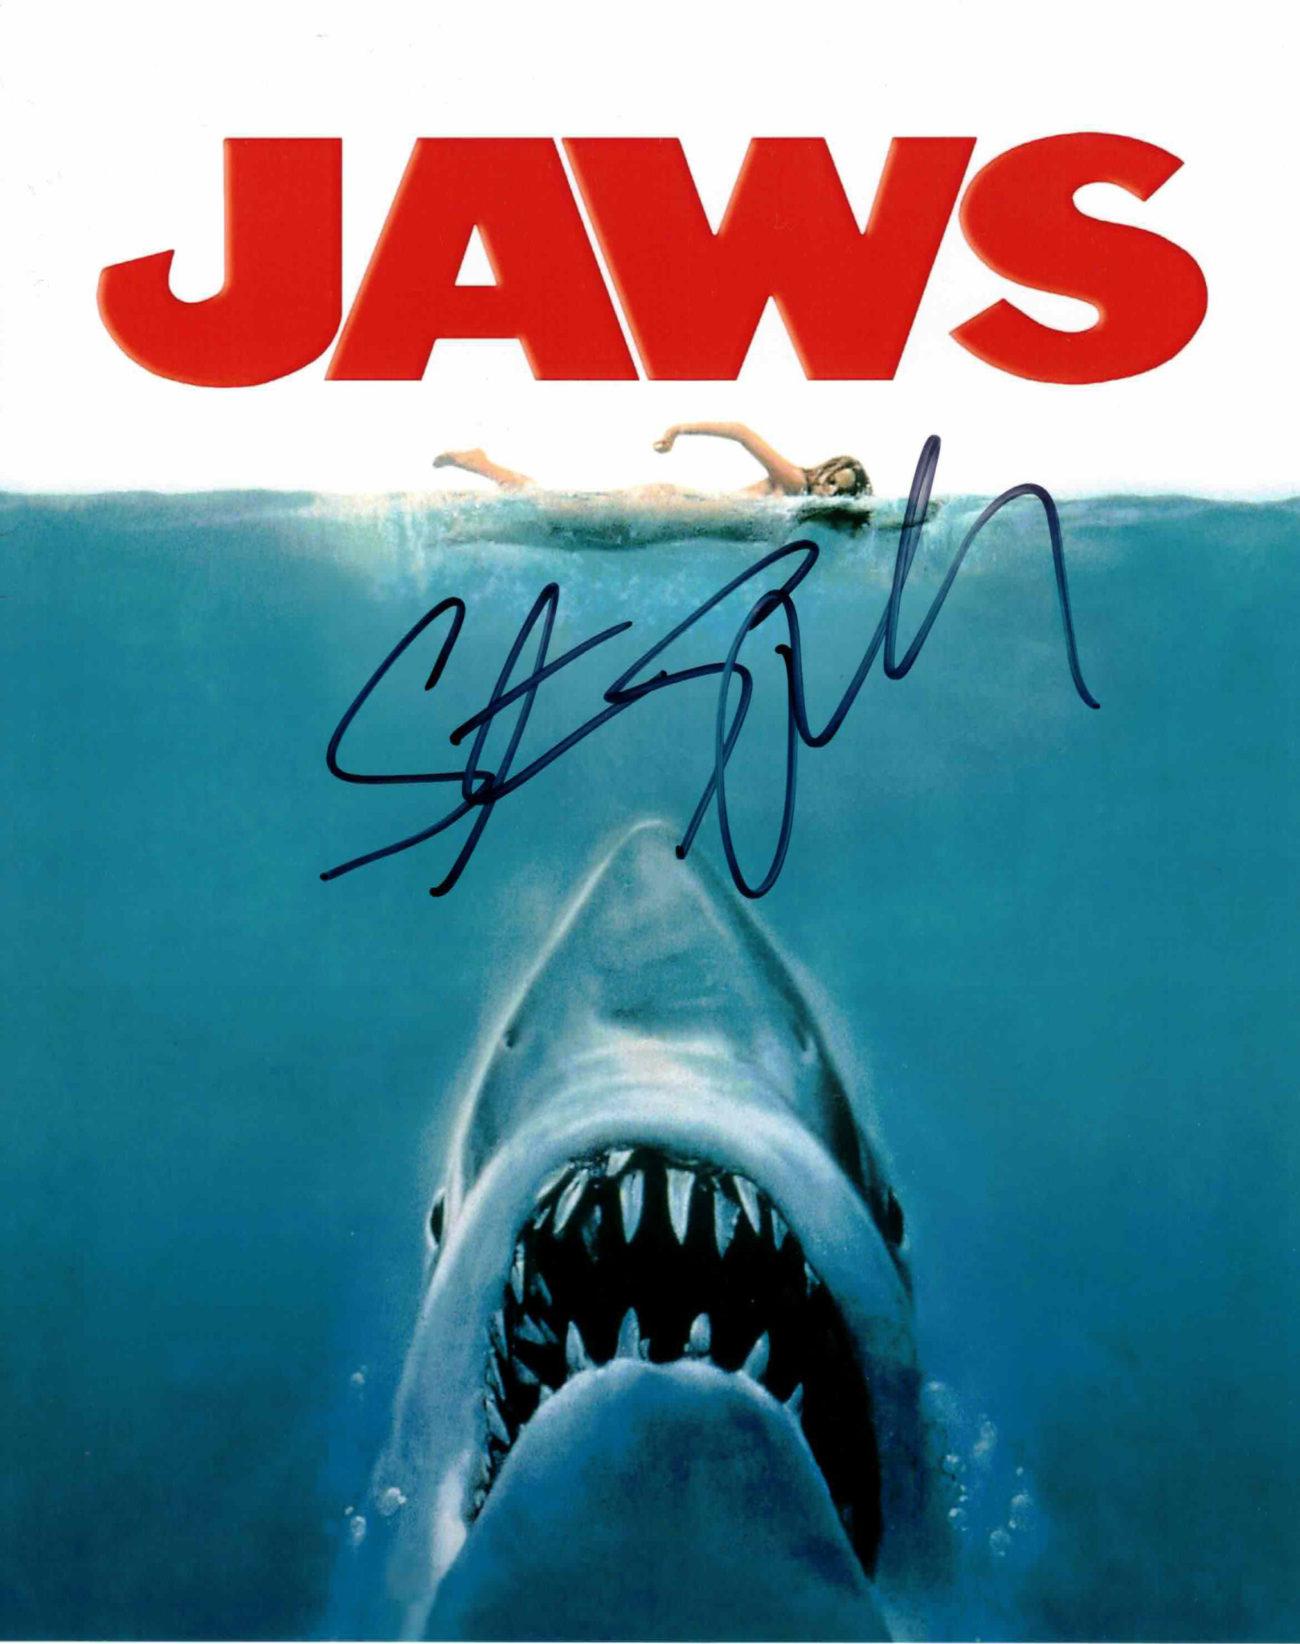 Steven Spielberg / Čelisti - autogram